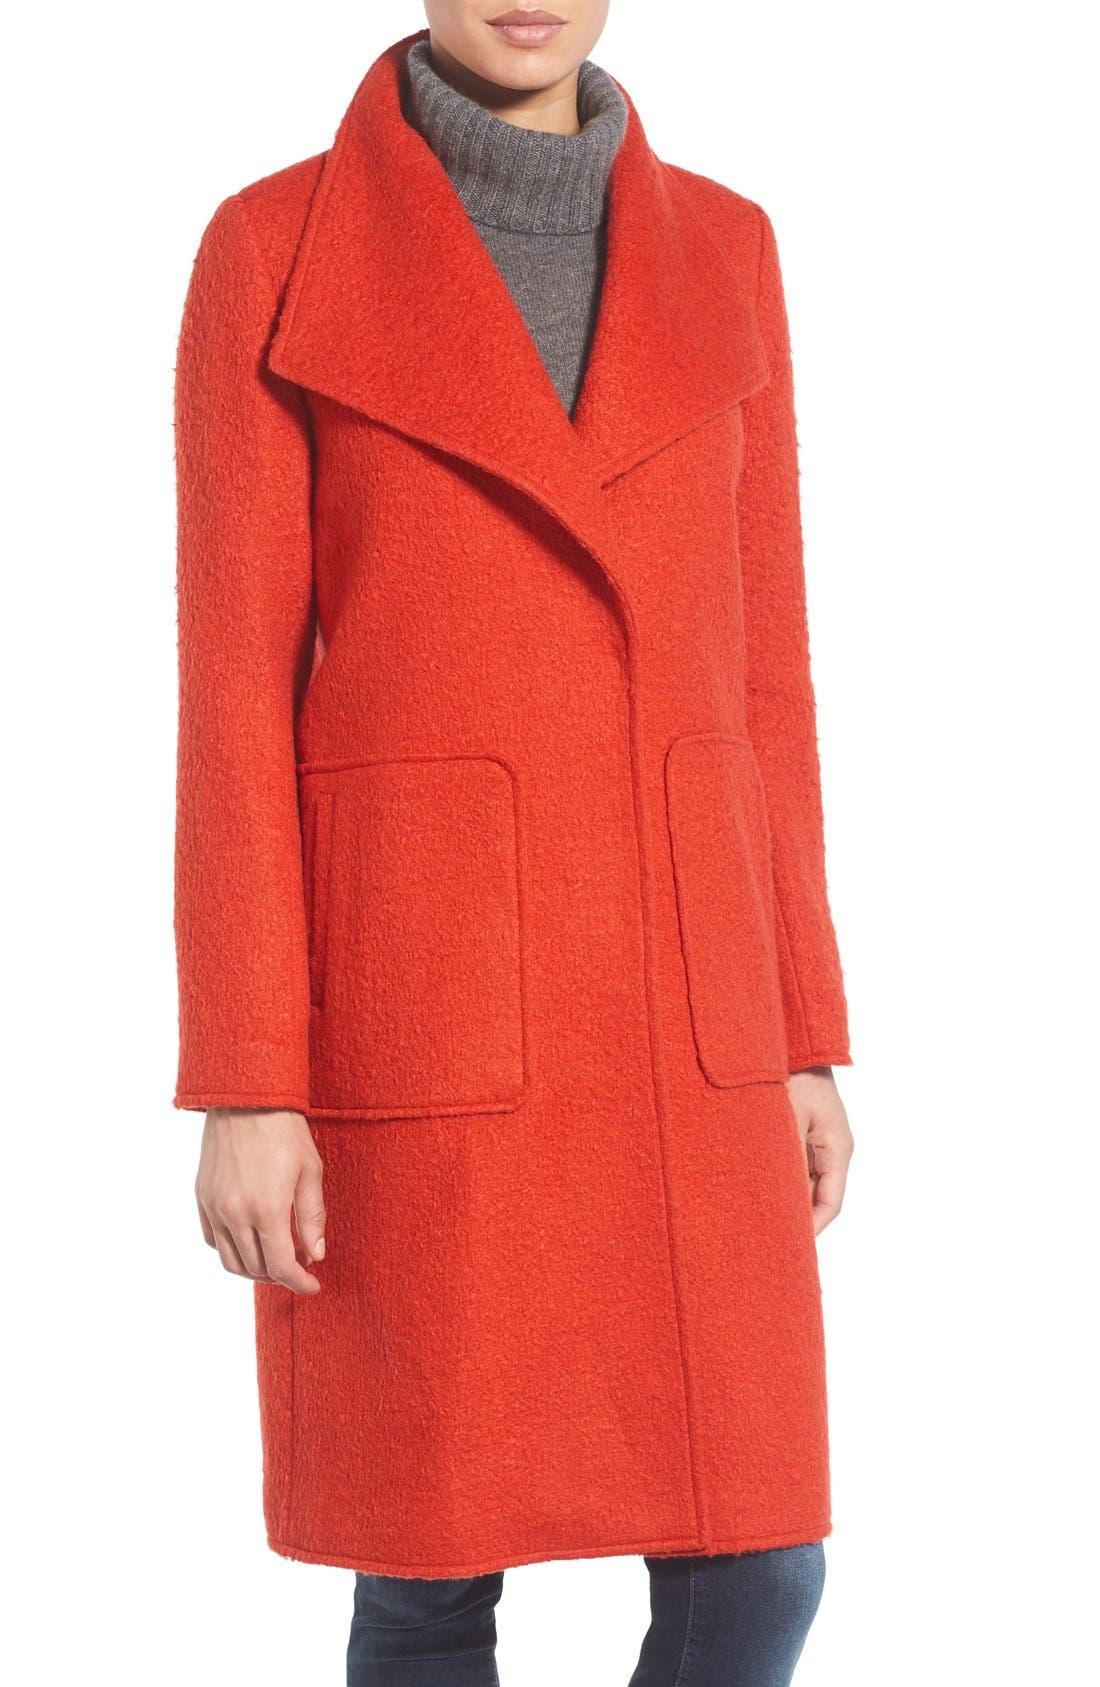 Alternate Image 1 Selected - Bernardo Textured Long Coat (Regular & Petite)